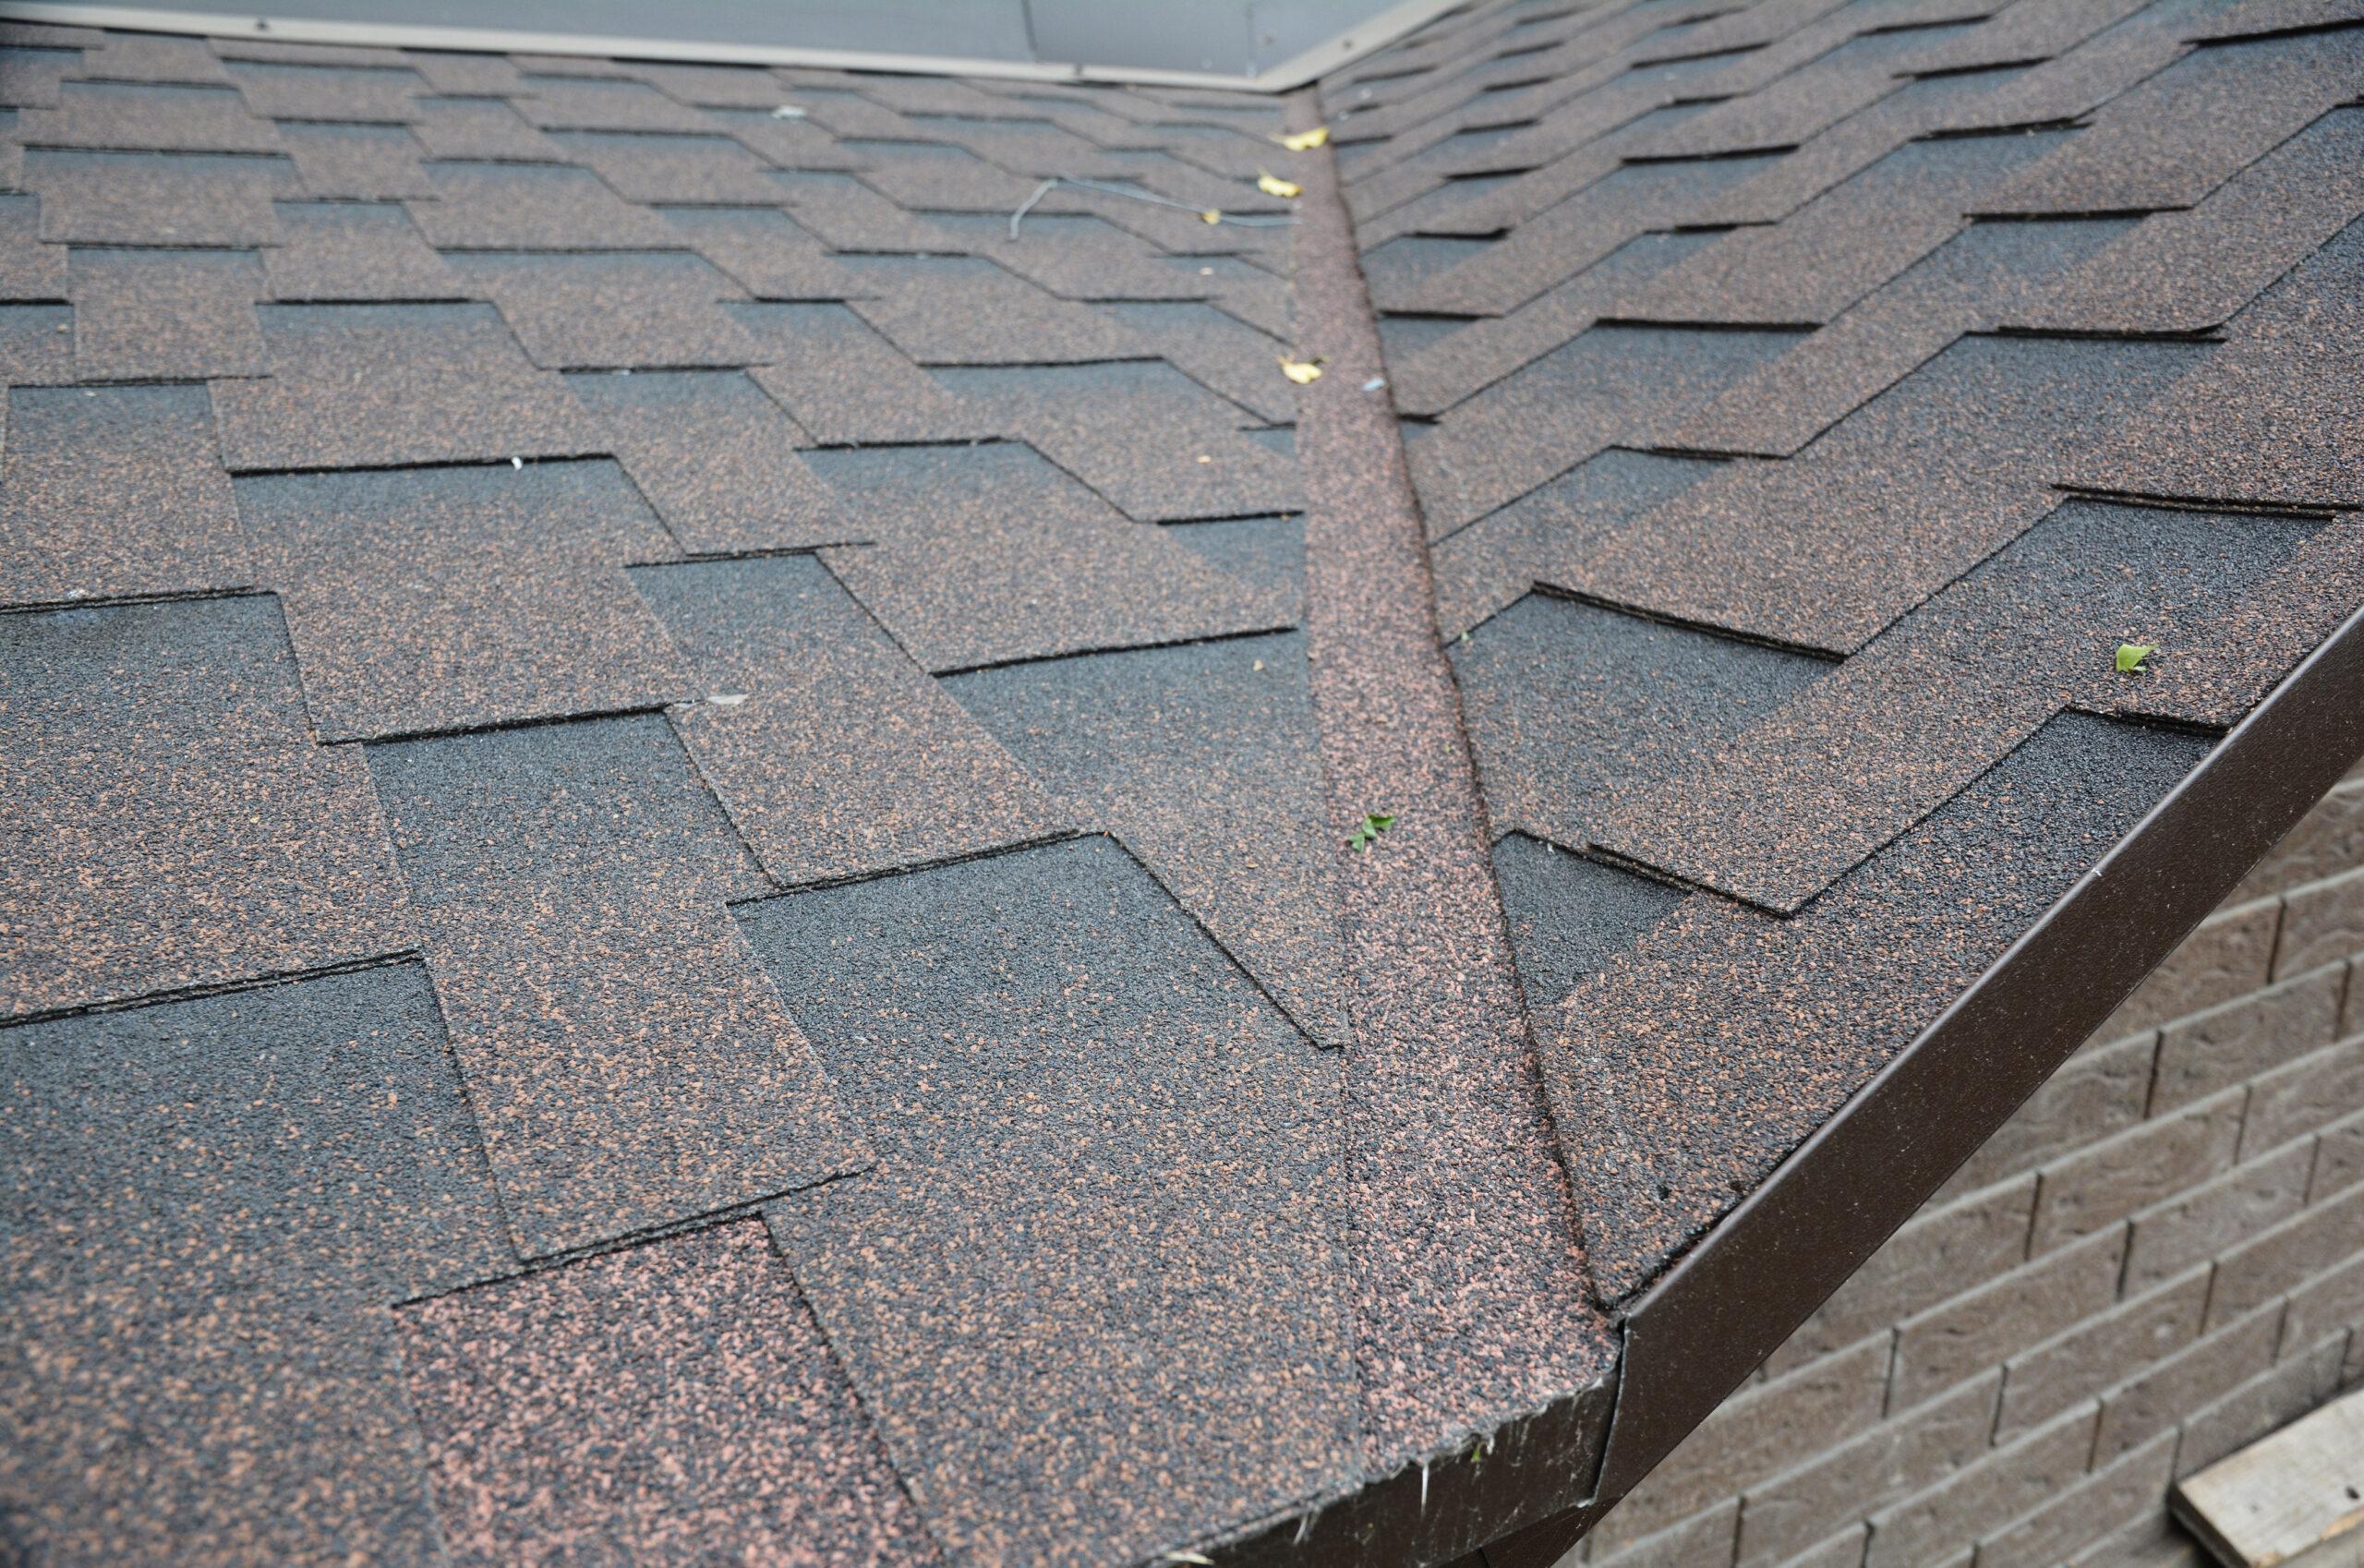 Shingled roof with flashing